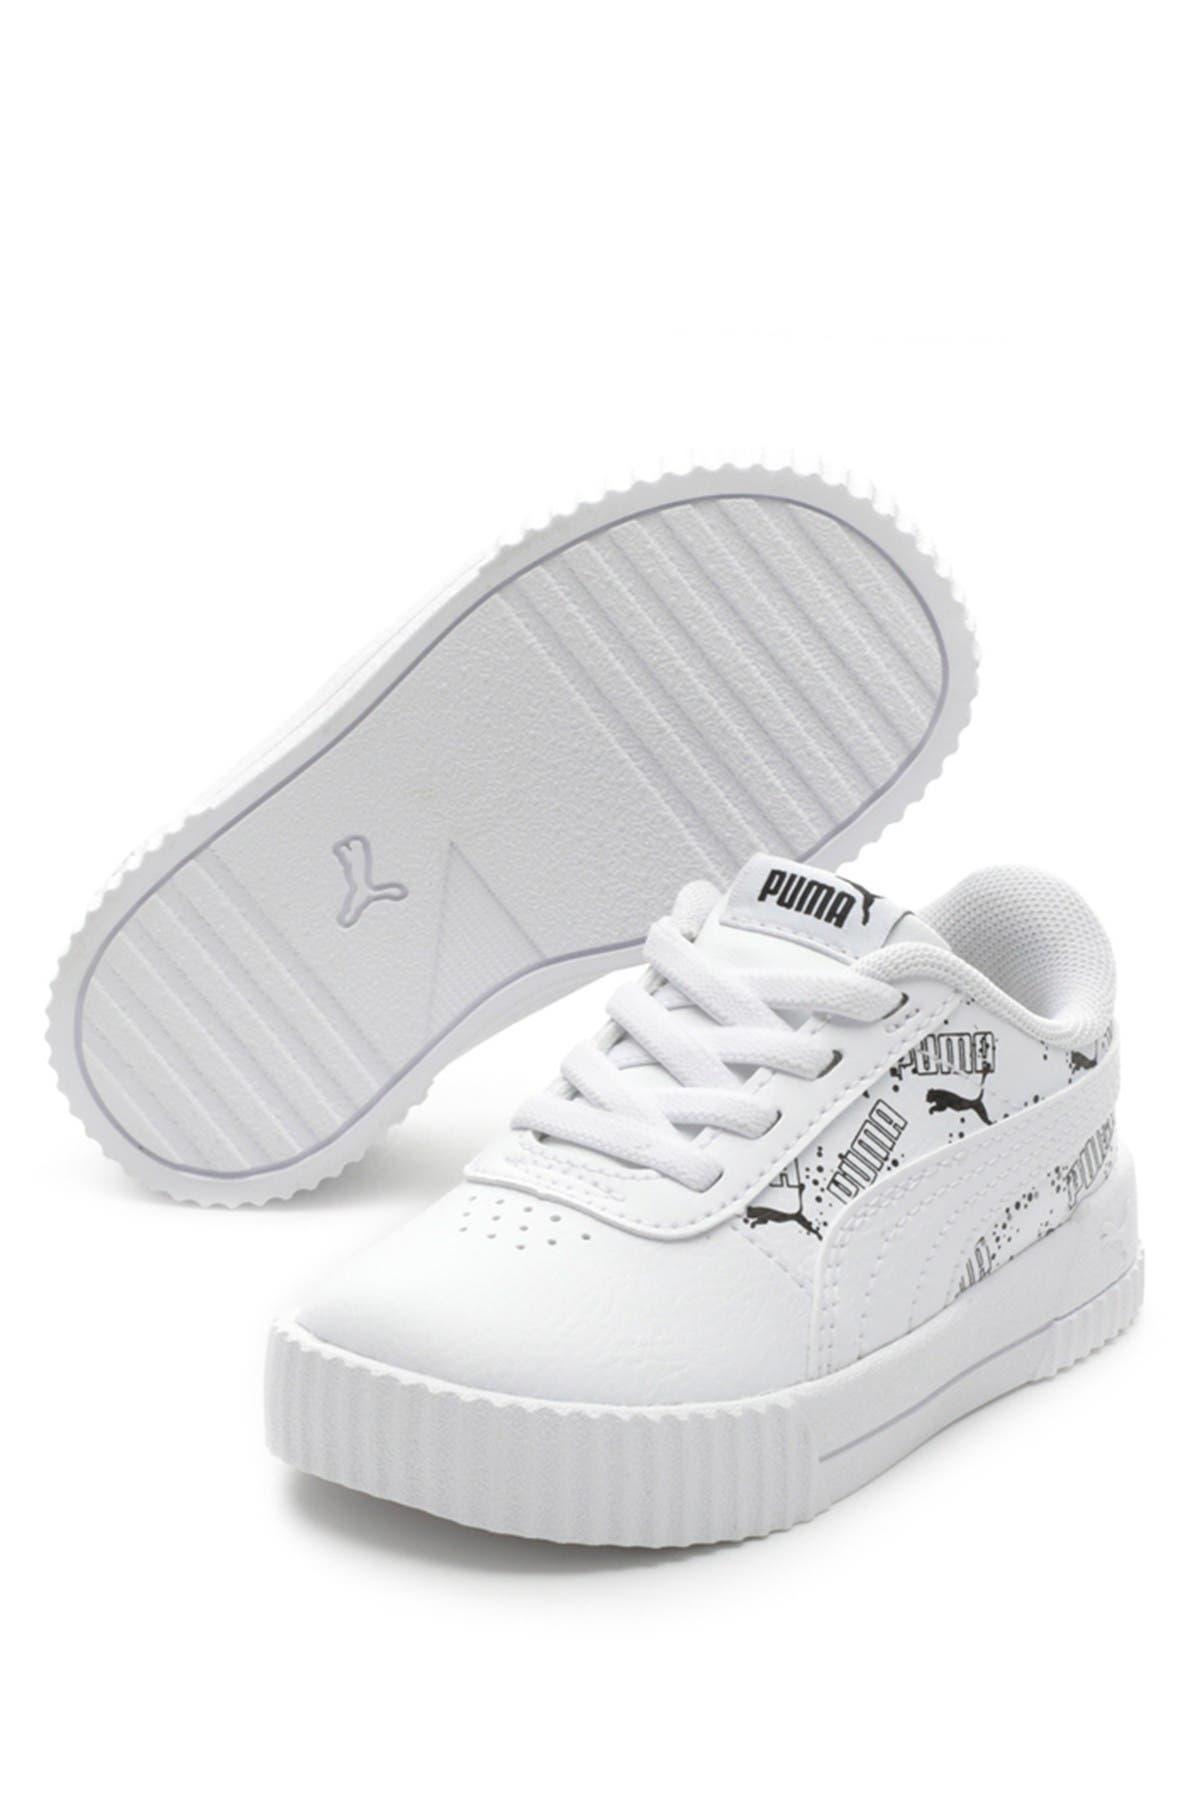 Image of PUMA Carina Hand Drawn Sneaker